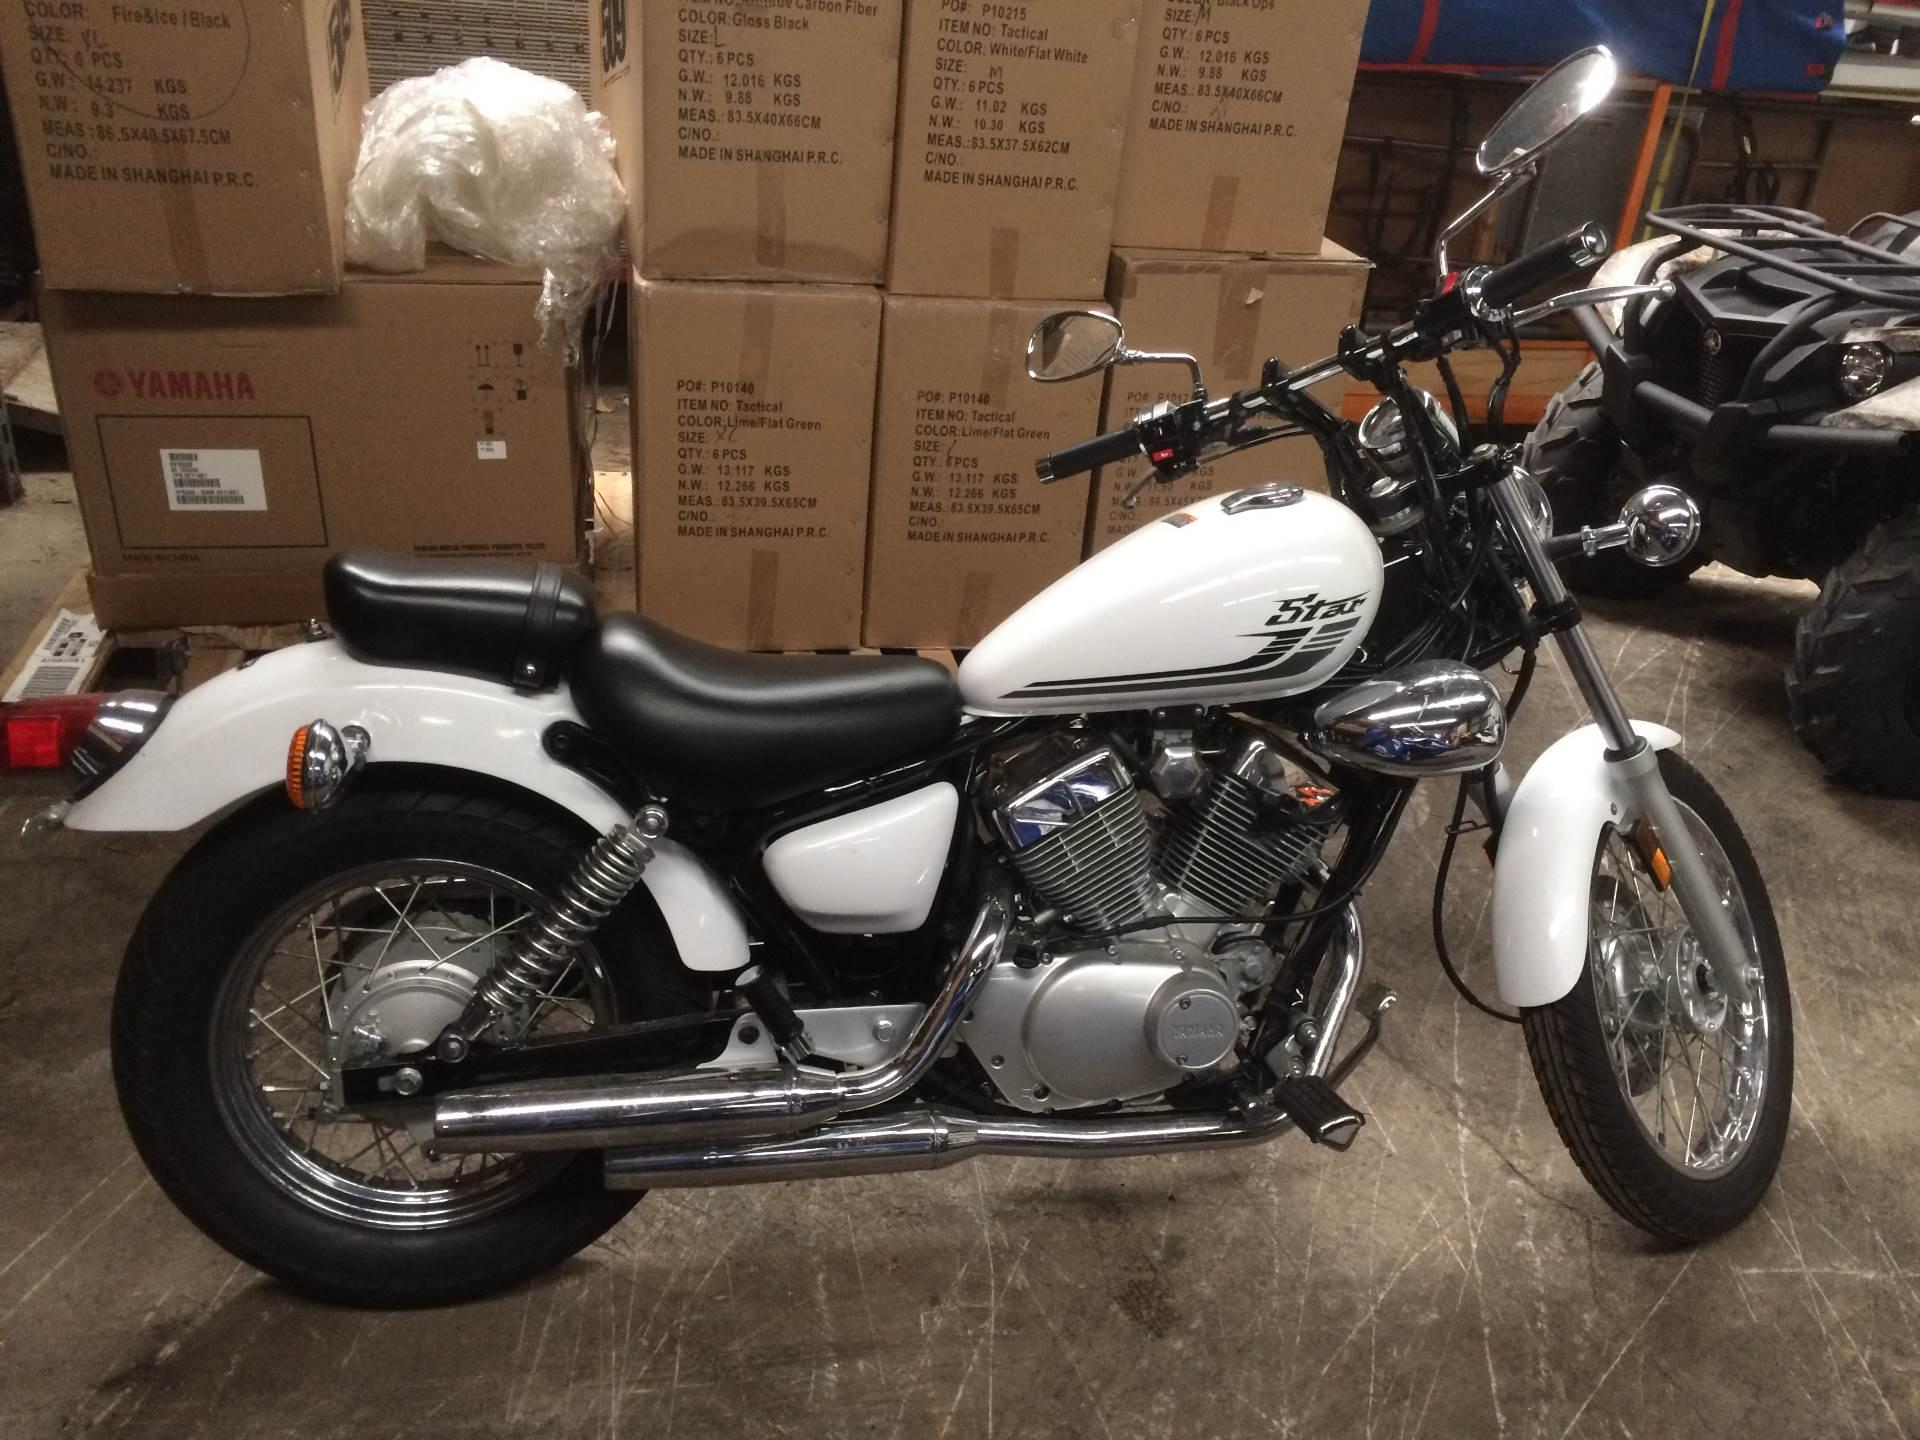 New 2016 Yamaha V Star 250 Motorcycles in Port Washington ...